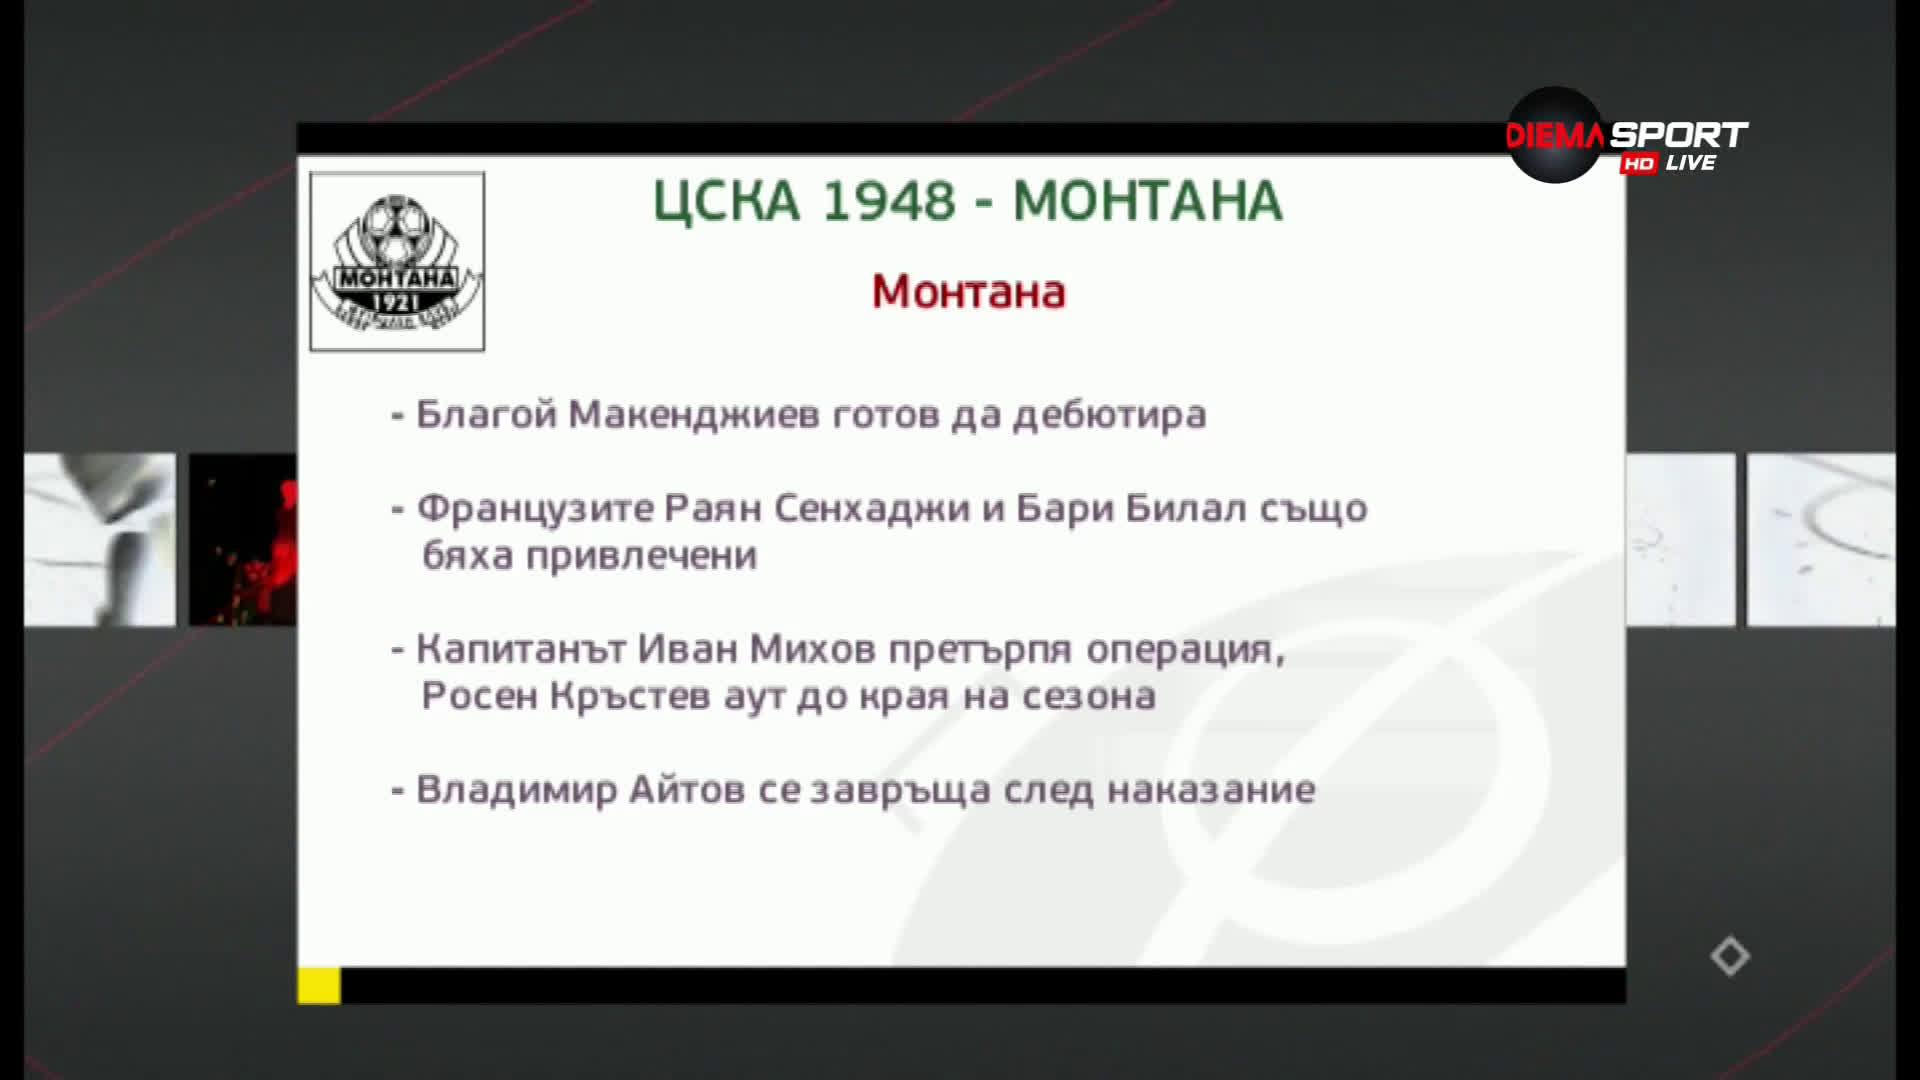 Преди ЦСКА 1948 - Монтана